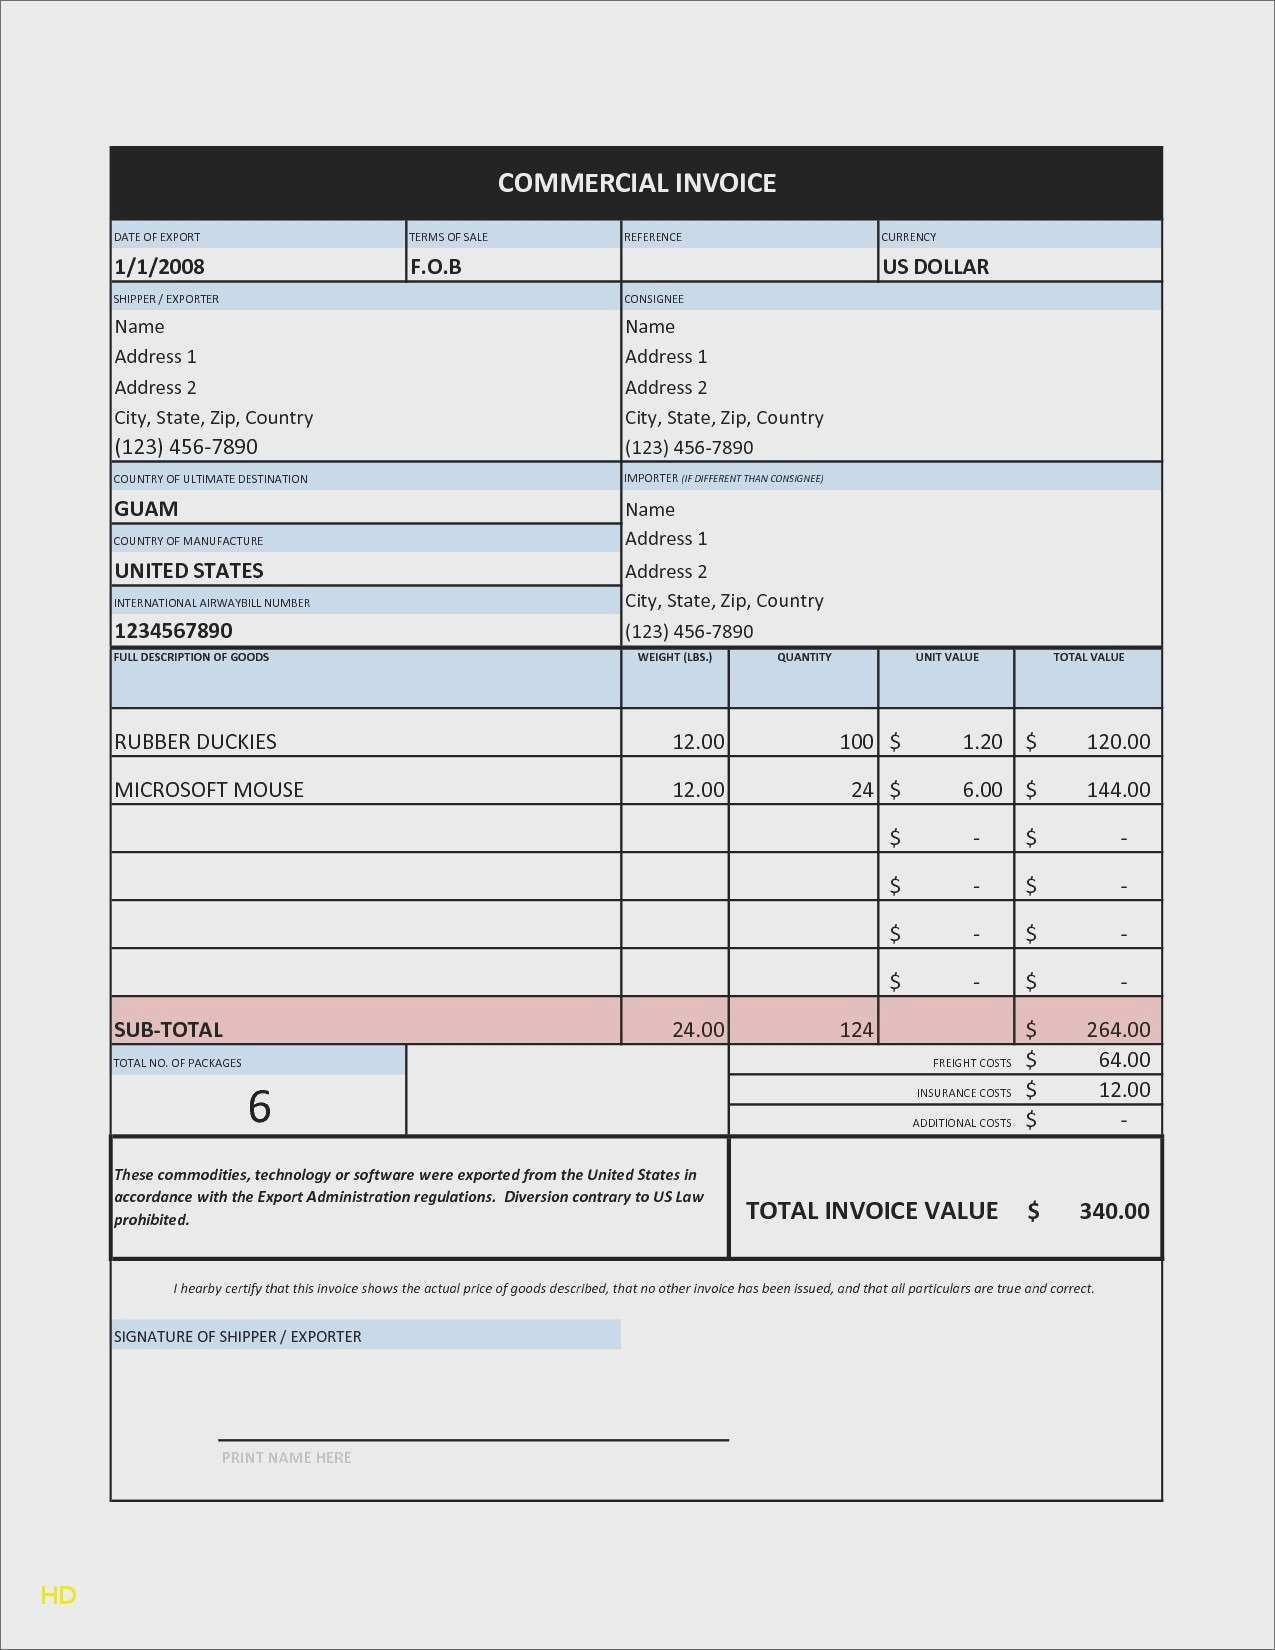 83 Format Vat Invoice Template In Saudi Arabia Formating for Vat Invoice Template In Saudi Arabia